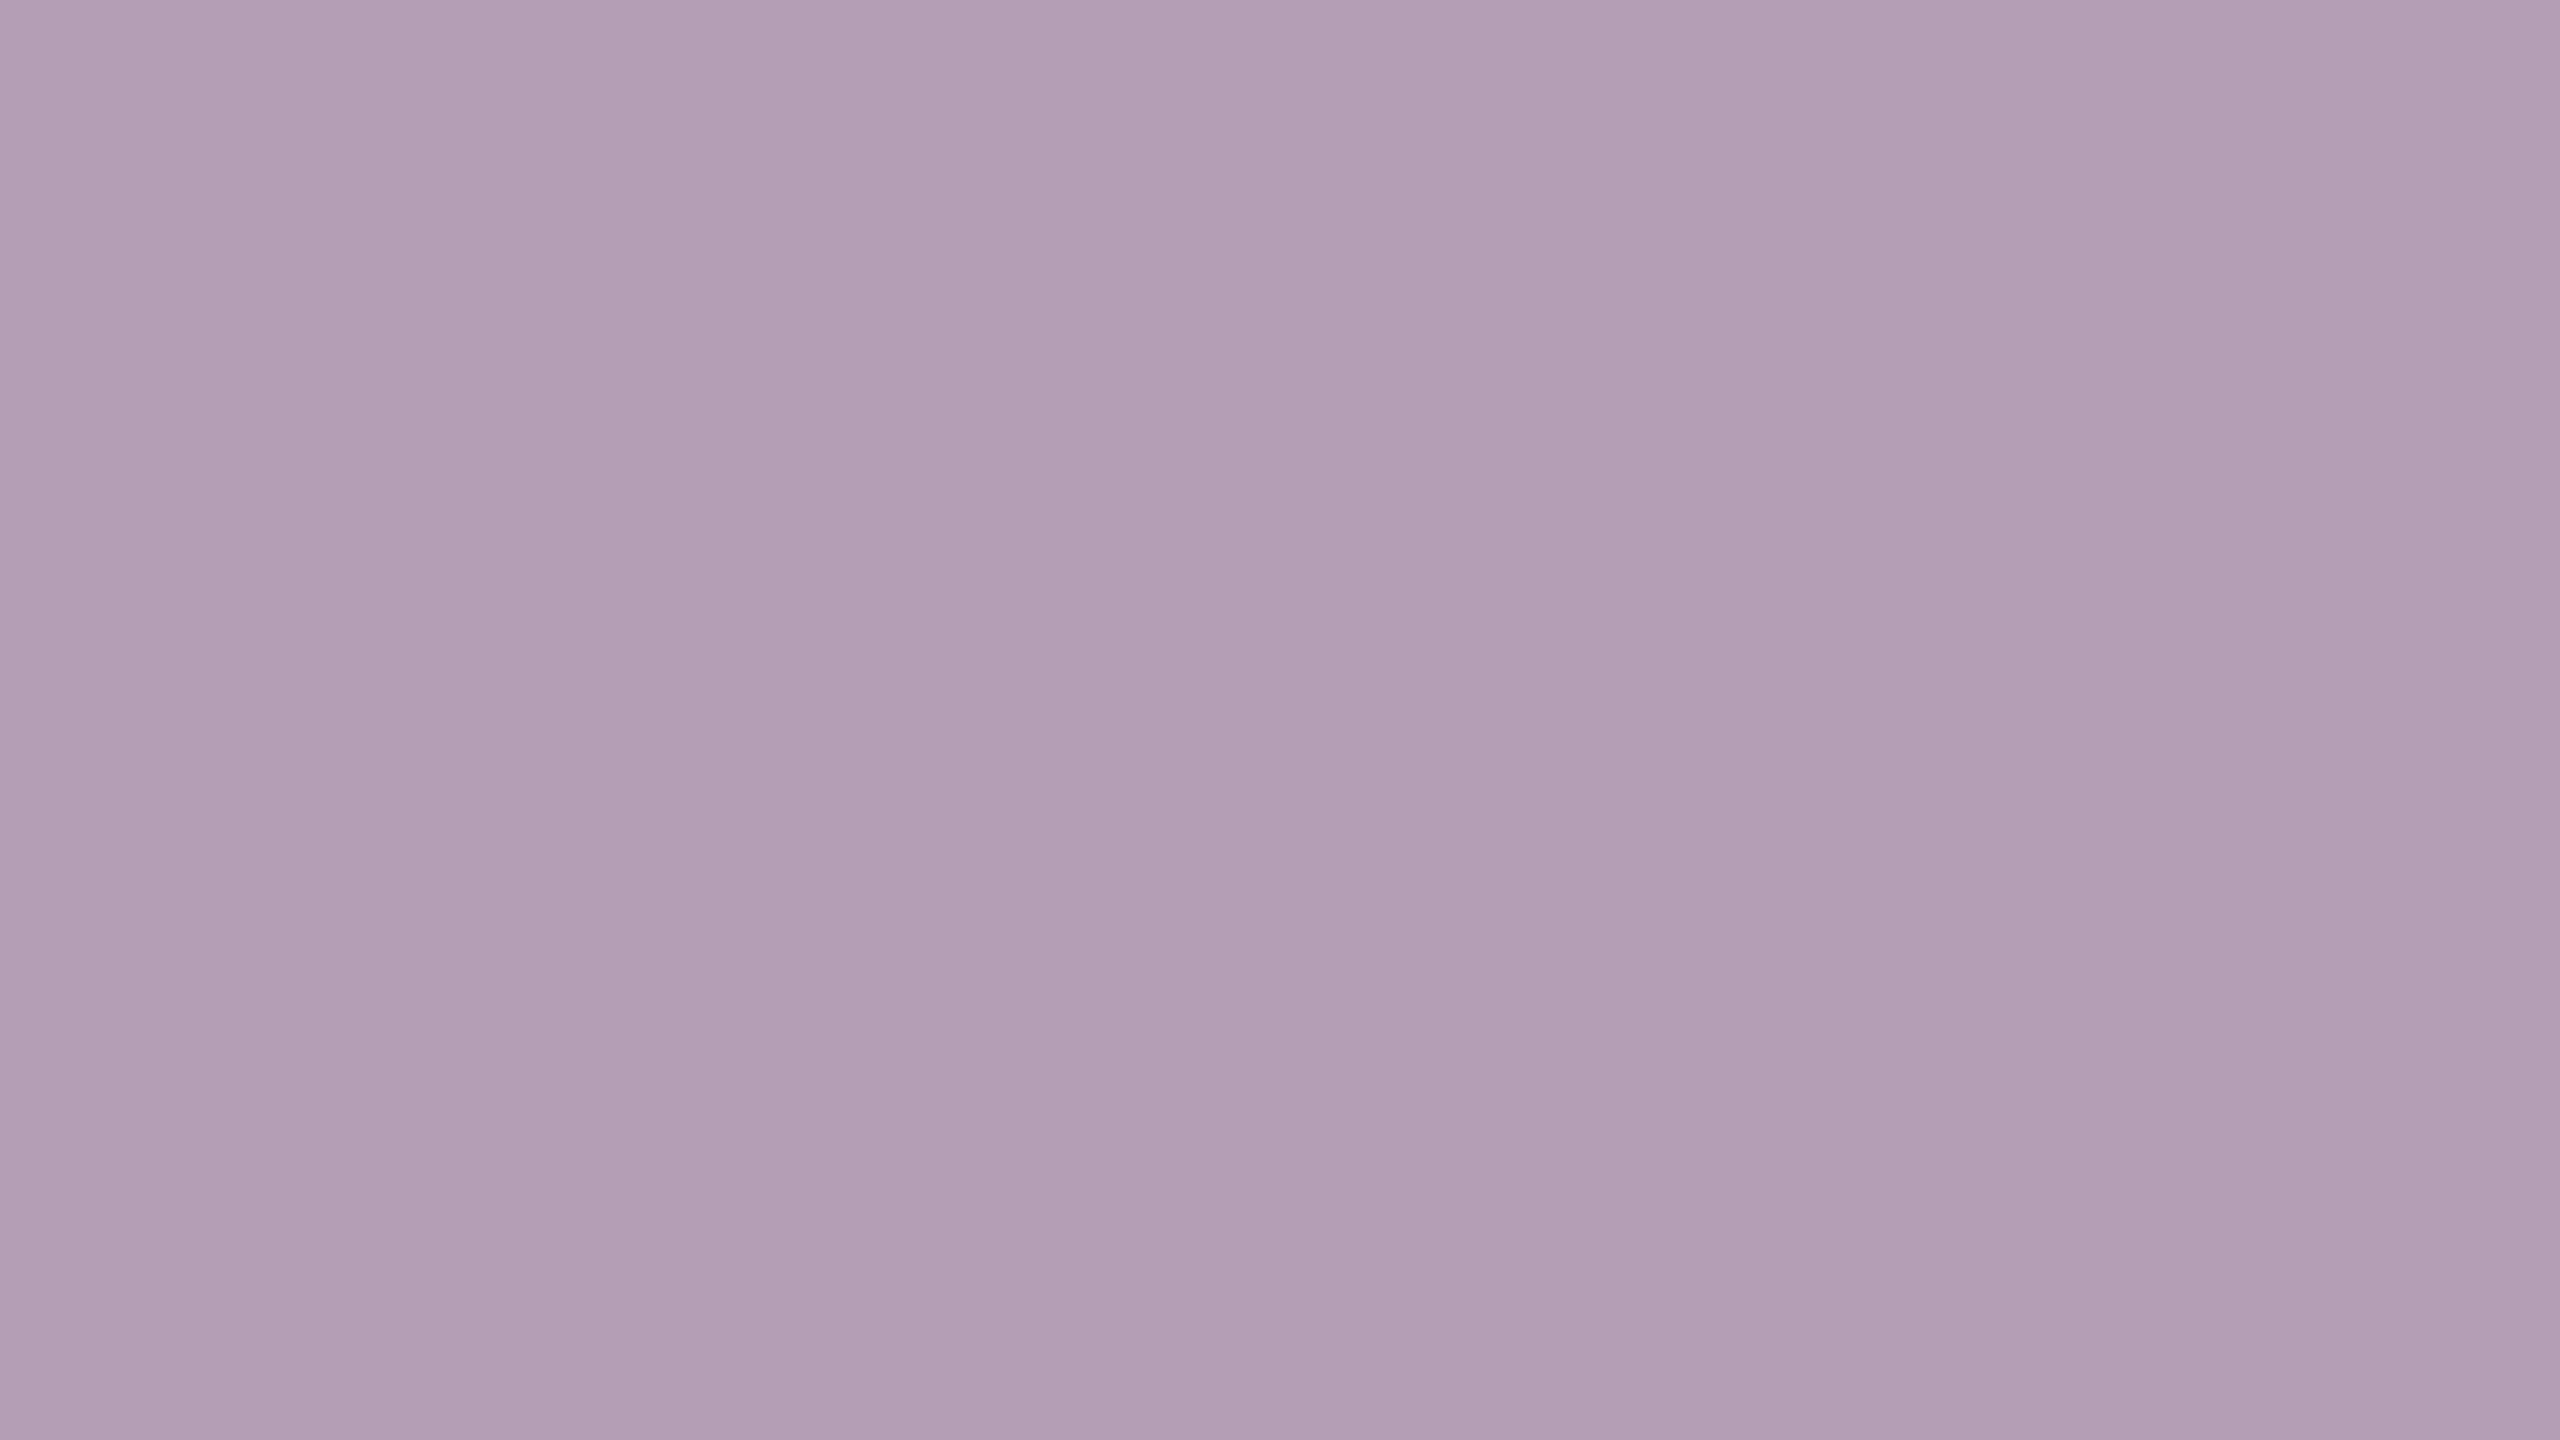 Pastel purple wallpaper - Chinoiserie Wallpaper Chinese Wallpaper